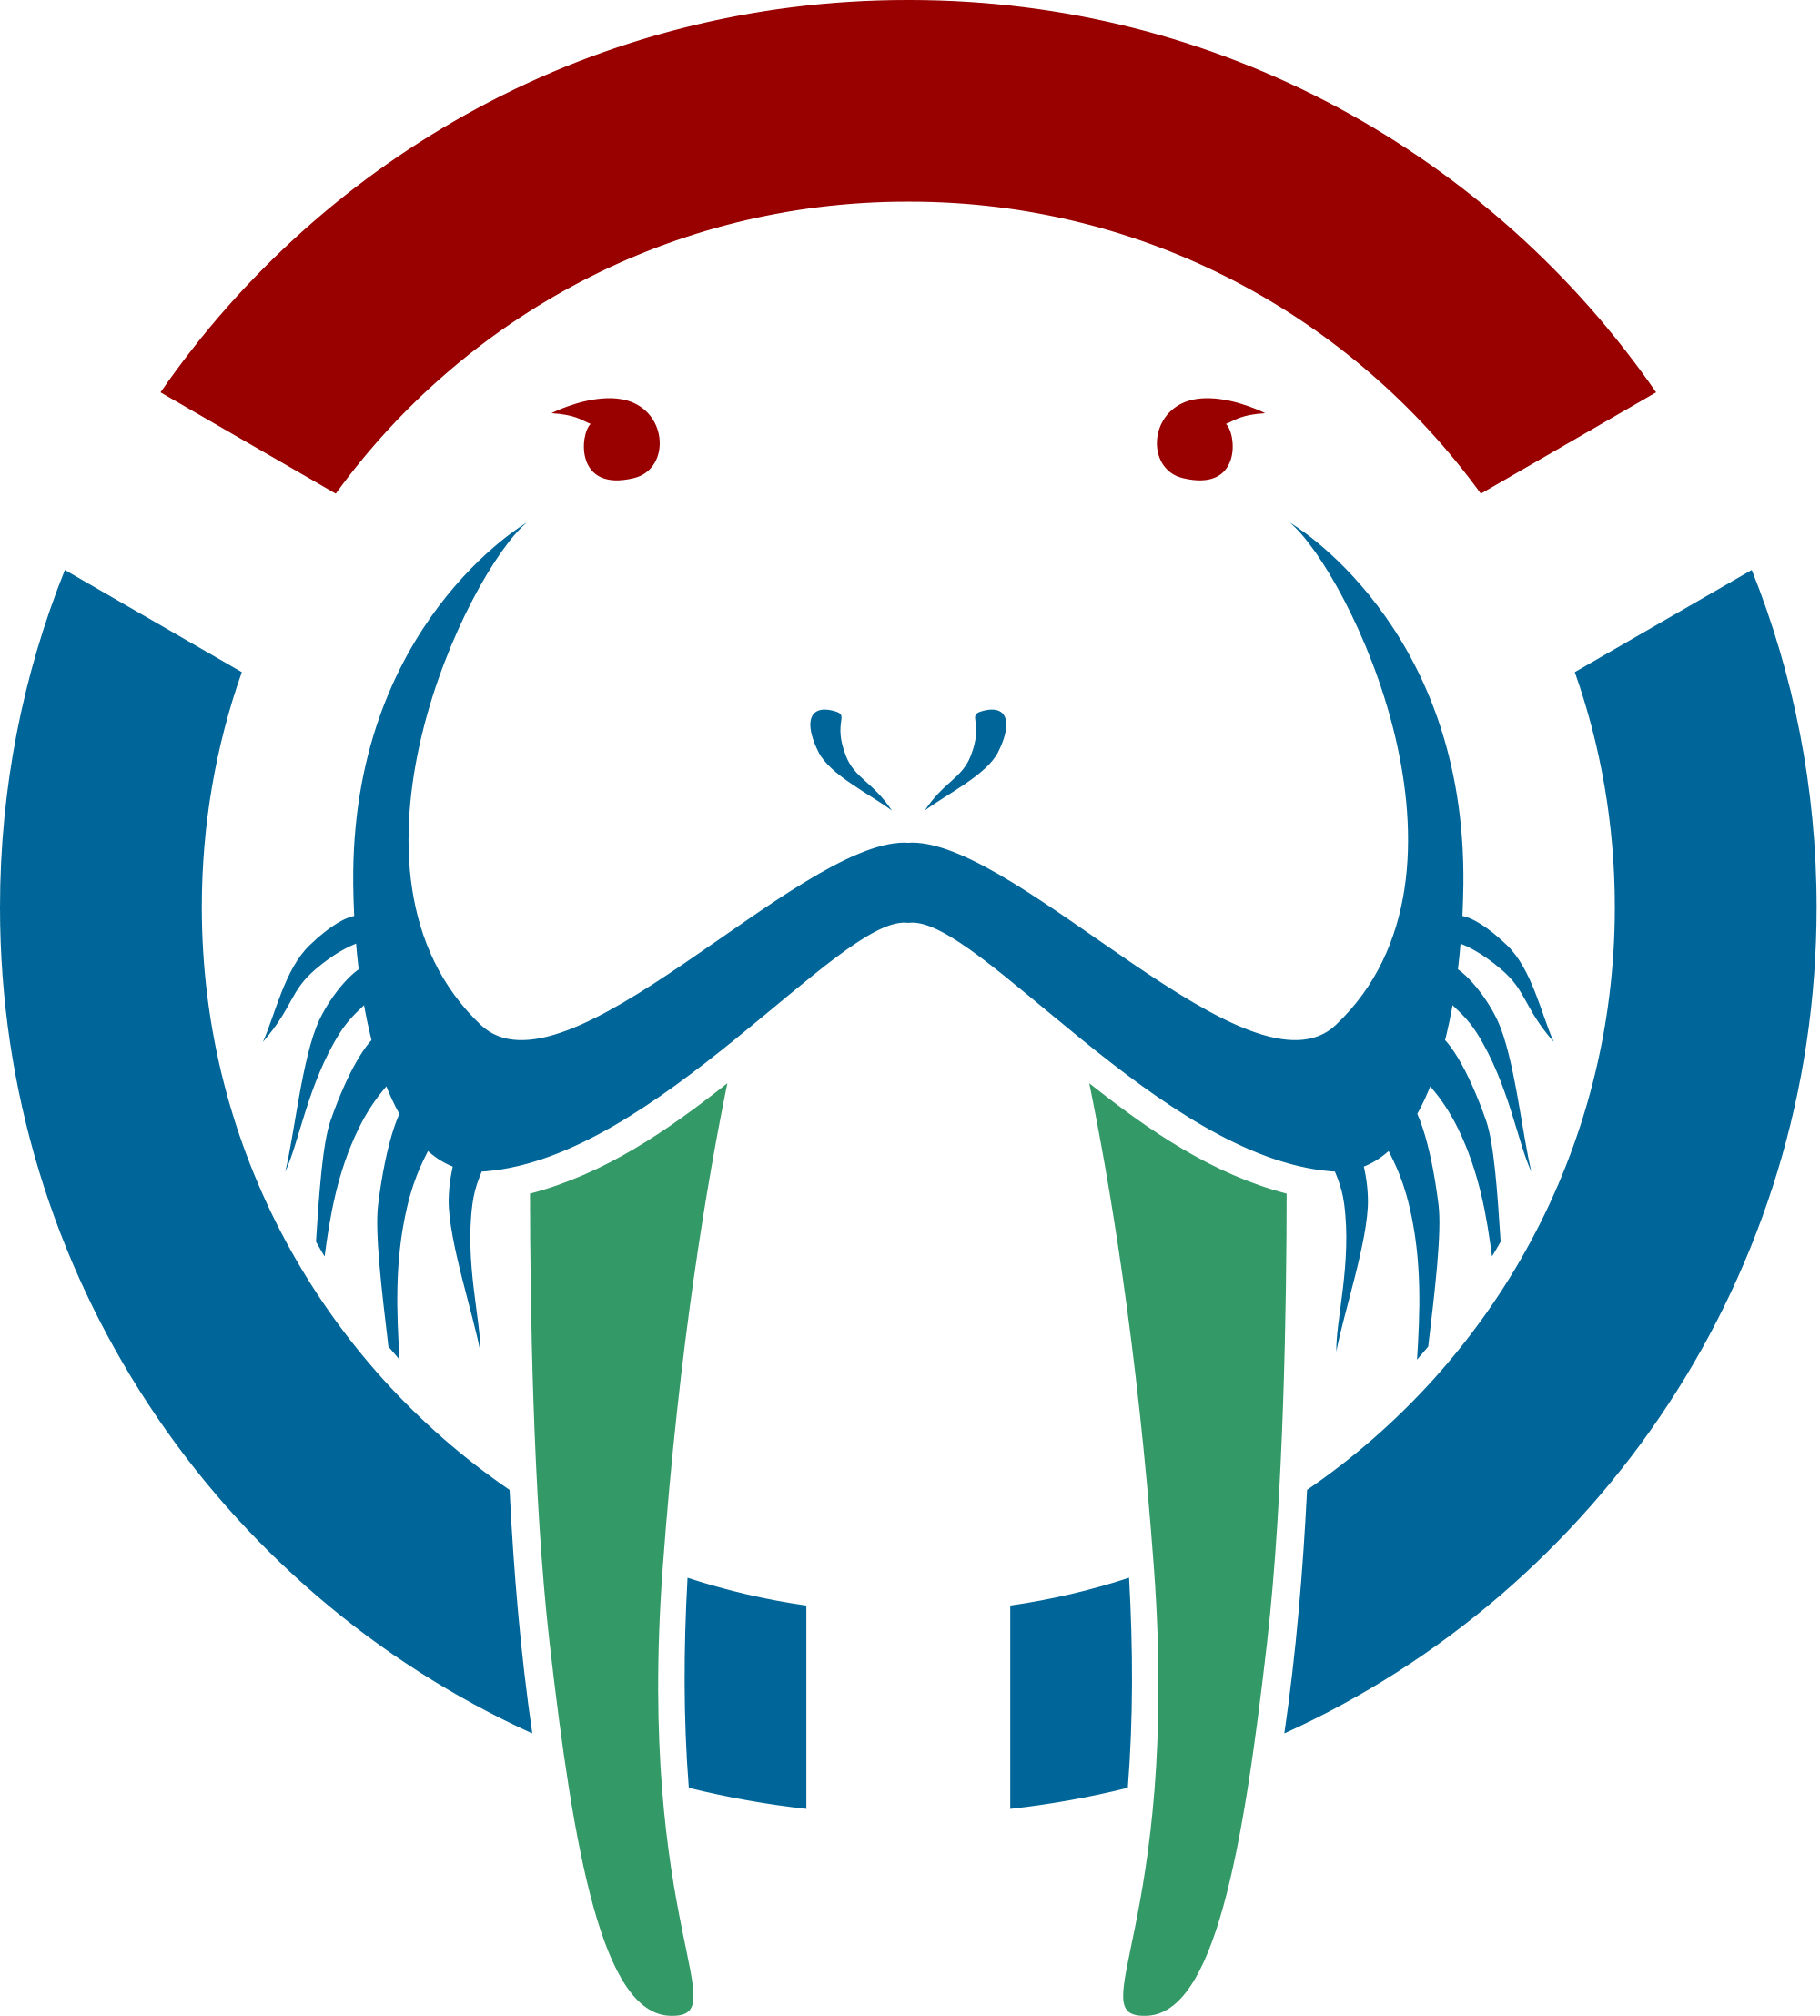 Walrus clipart svg. File logo notext wikimedia